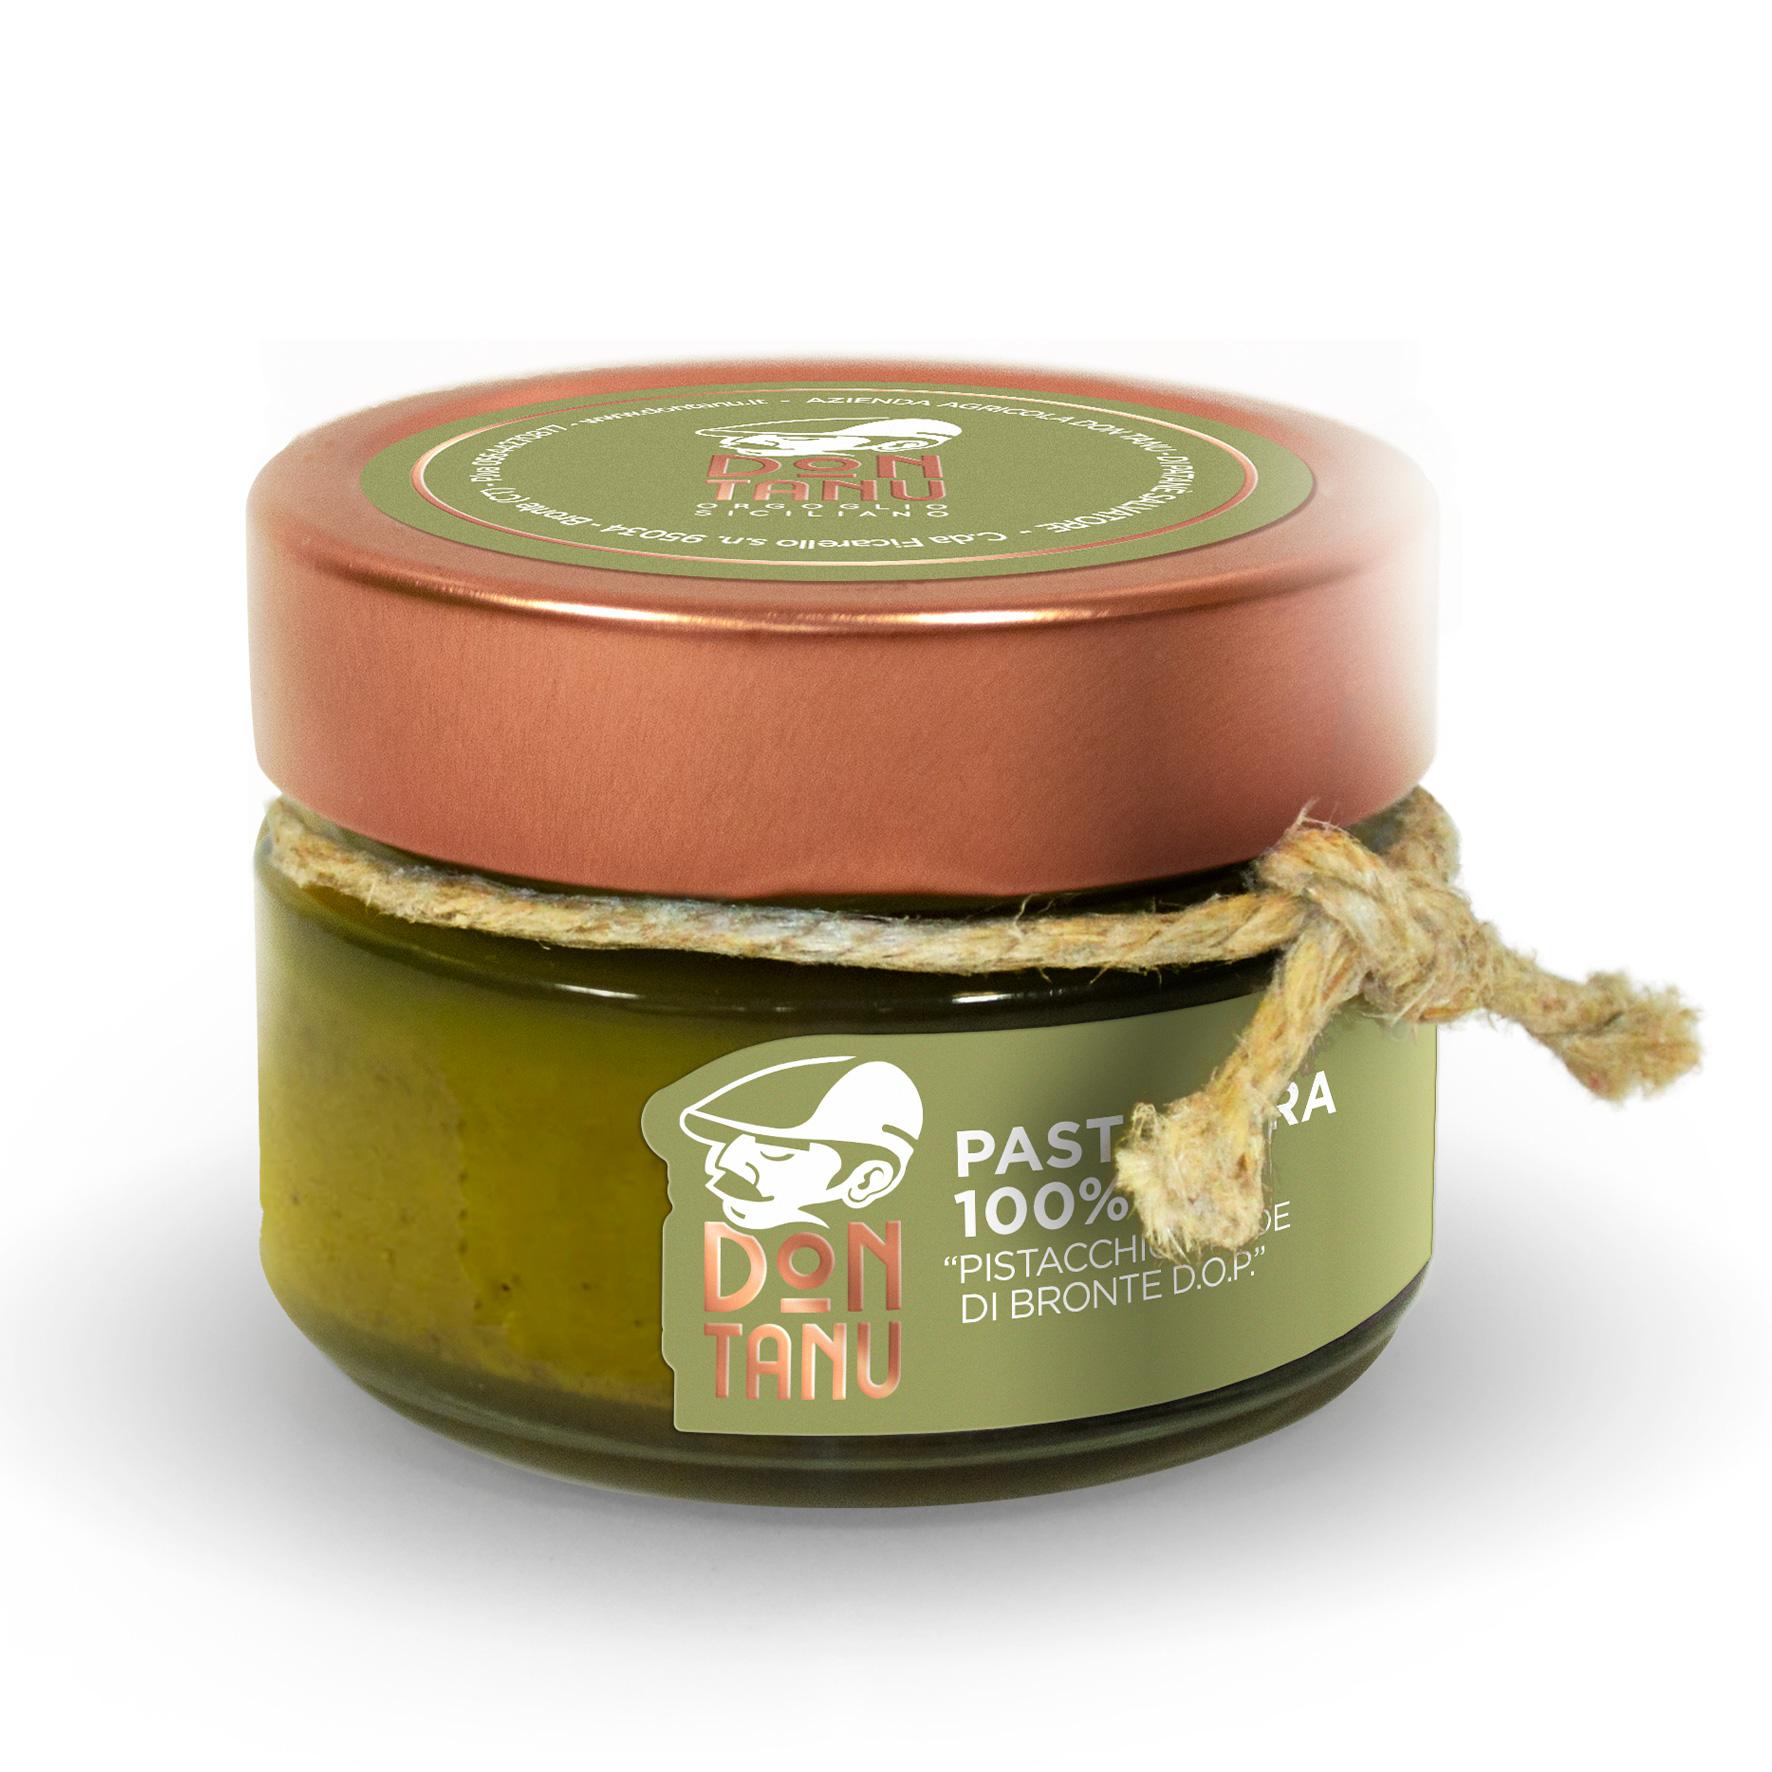 Pasta pura di pistacchio verde di Bronte DOP 100 g